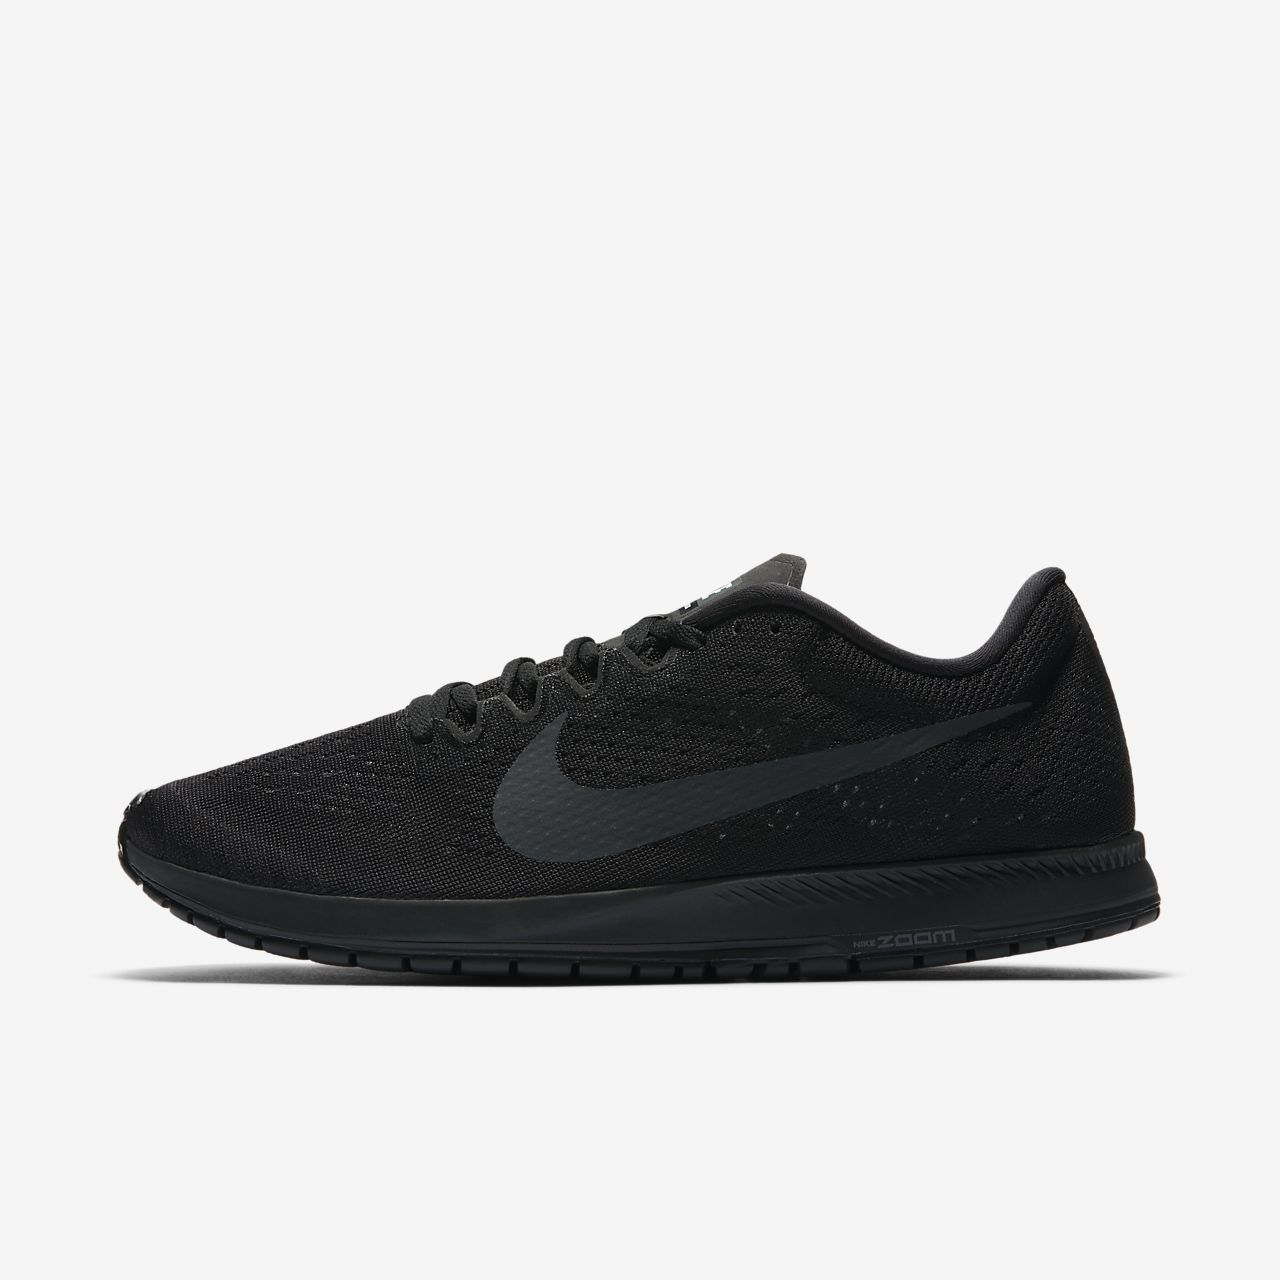 Nike Zoom Strie 6 Unisexe MybsYwmO